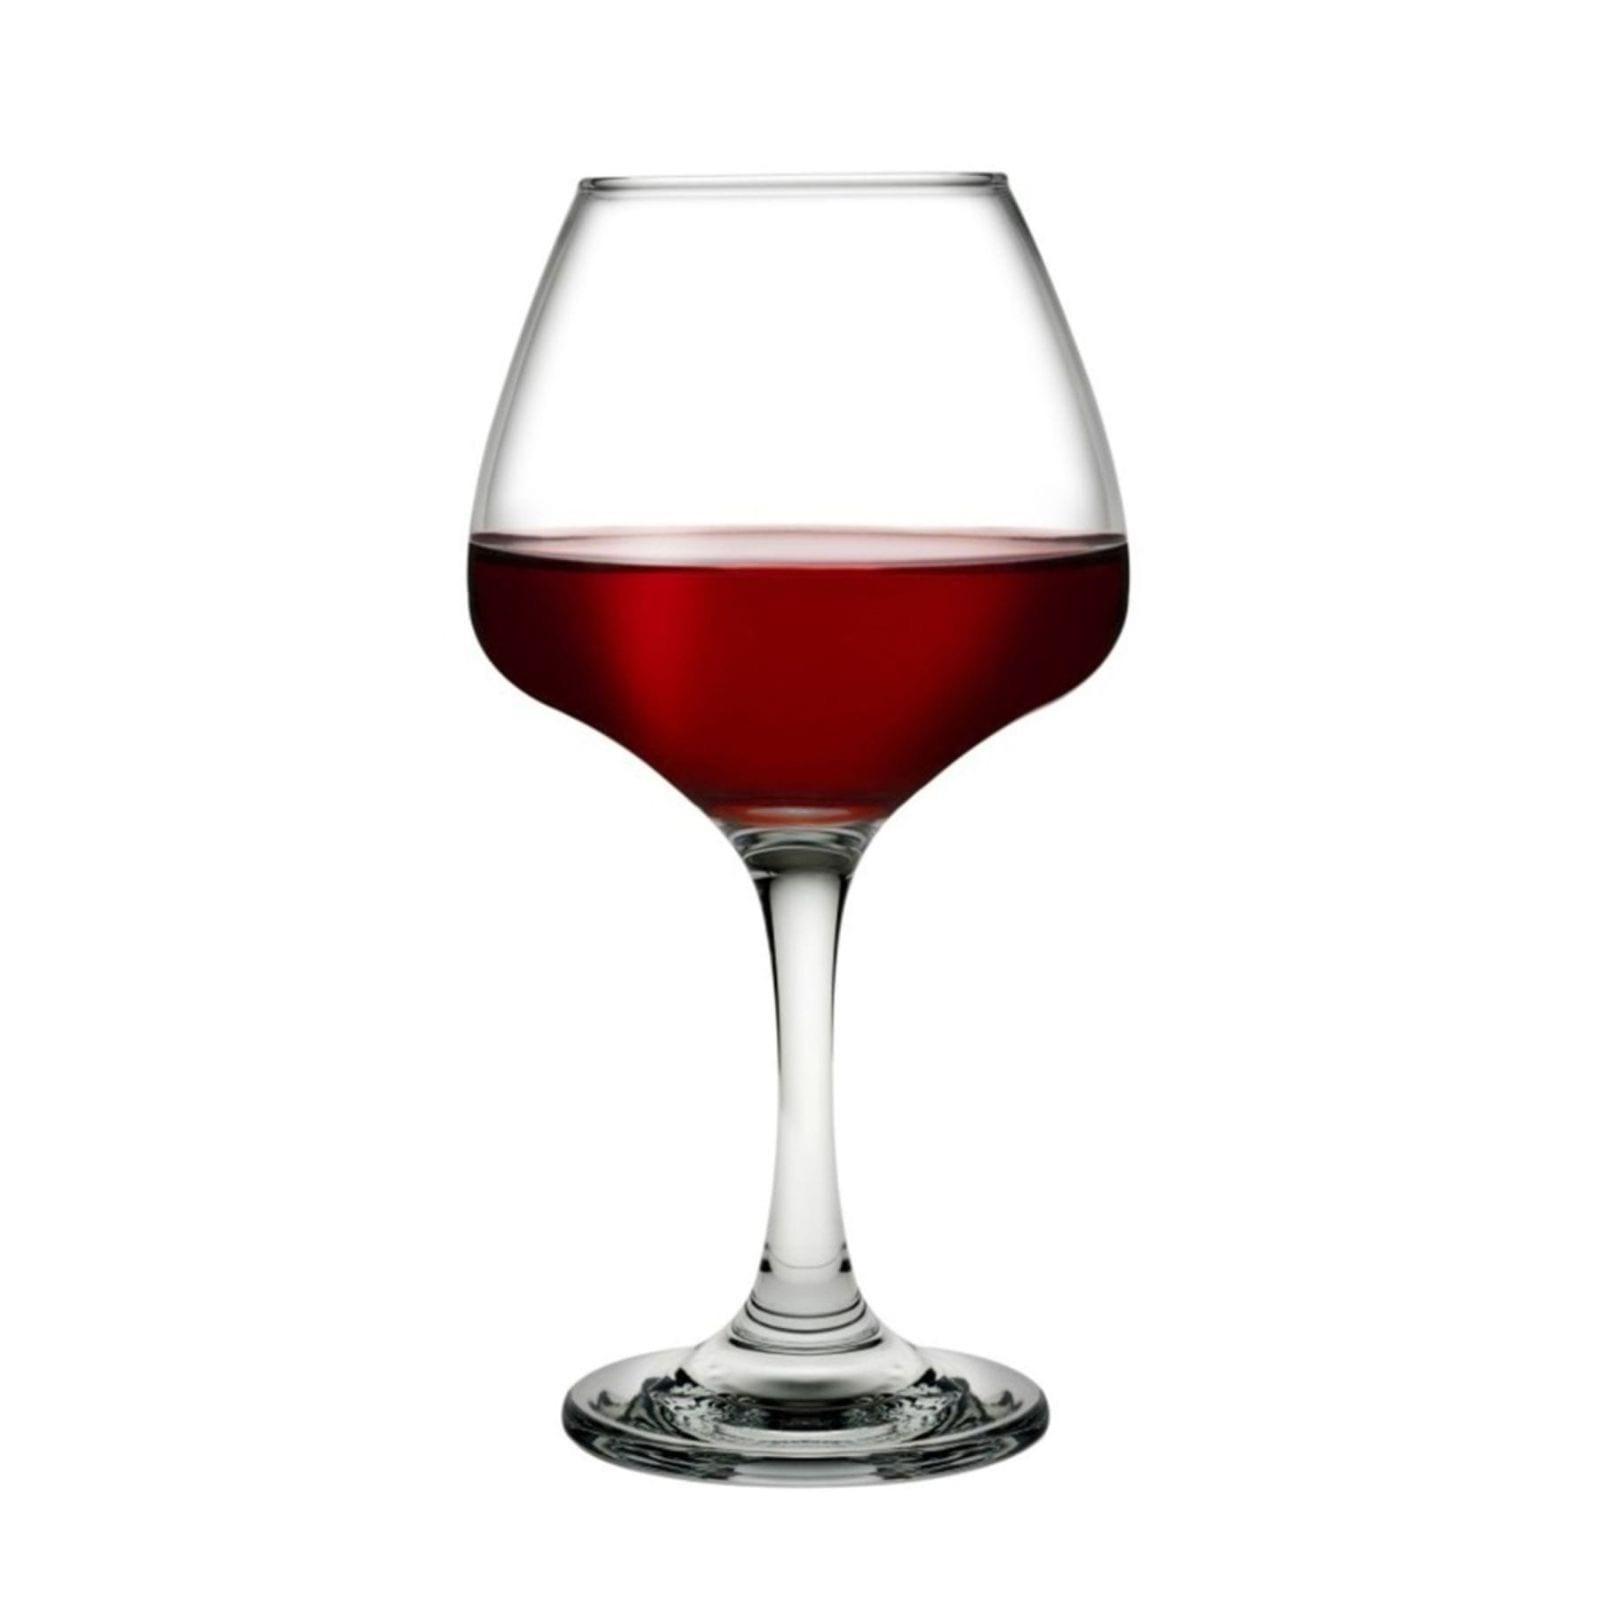 Risus Wine Glasses 580 ml (Set of 6) - Espiel